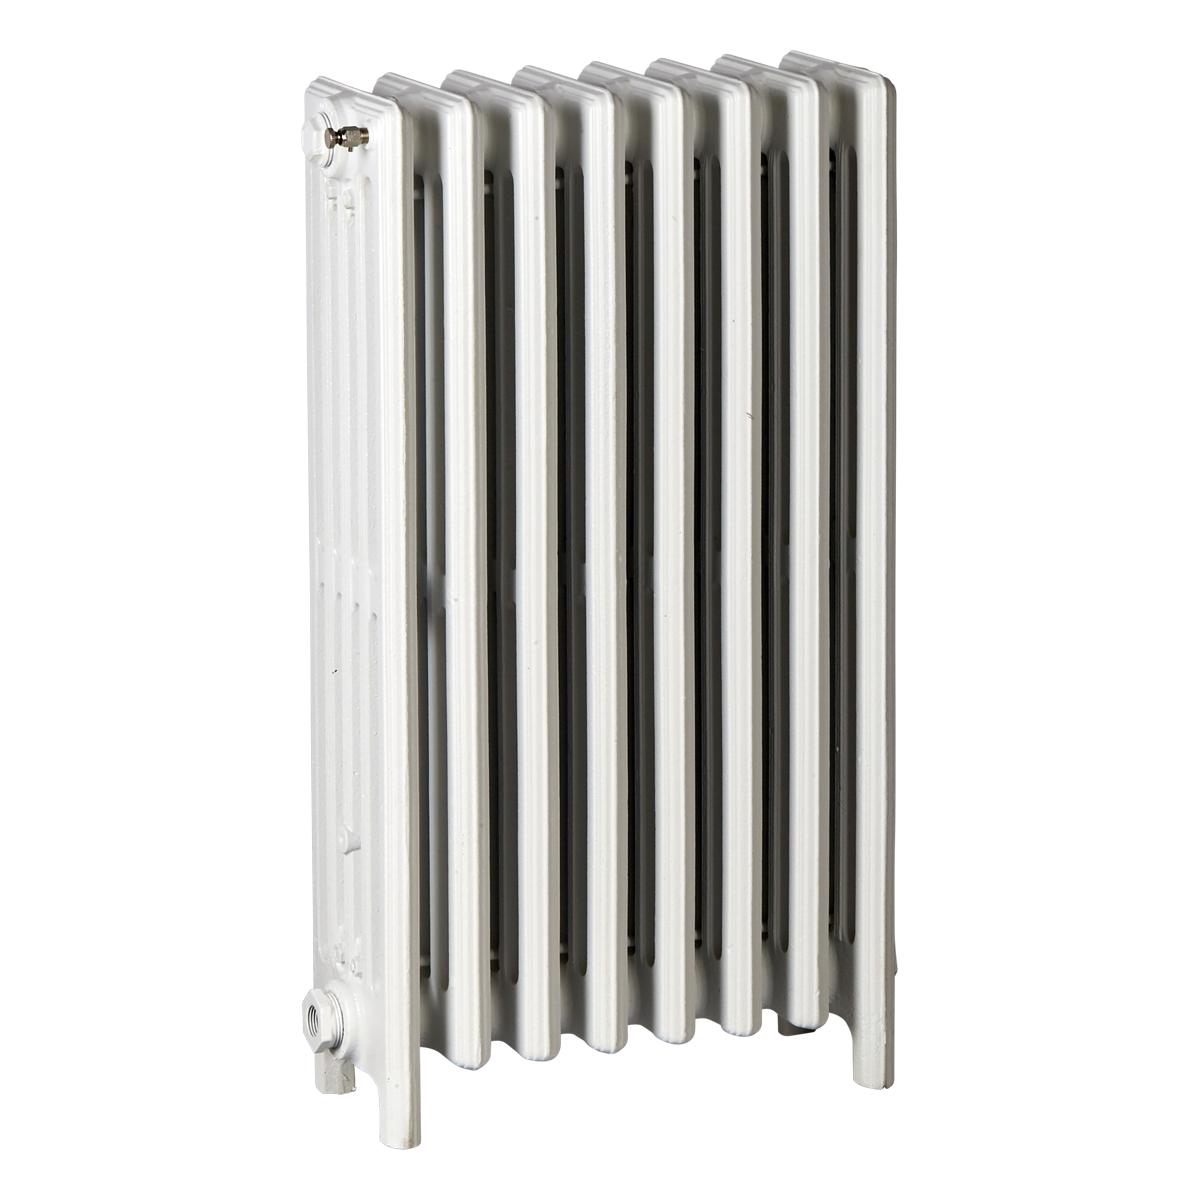 Ironworks Radiators Inc. classic slender column radiator